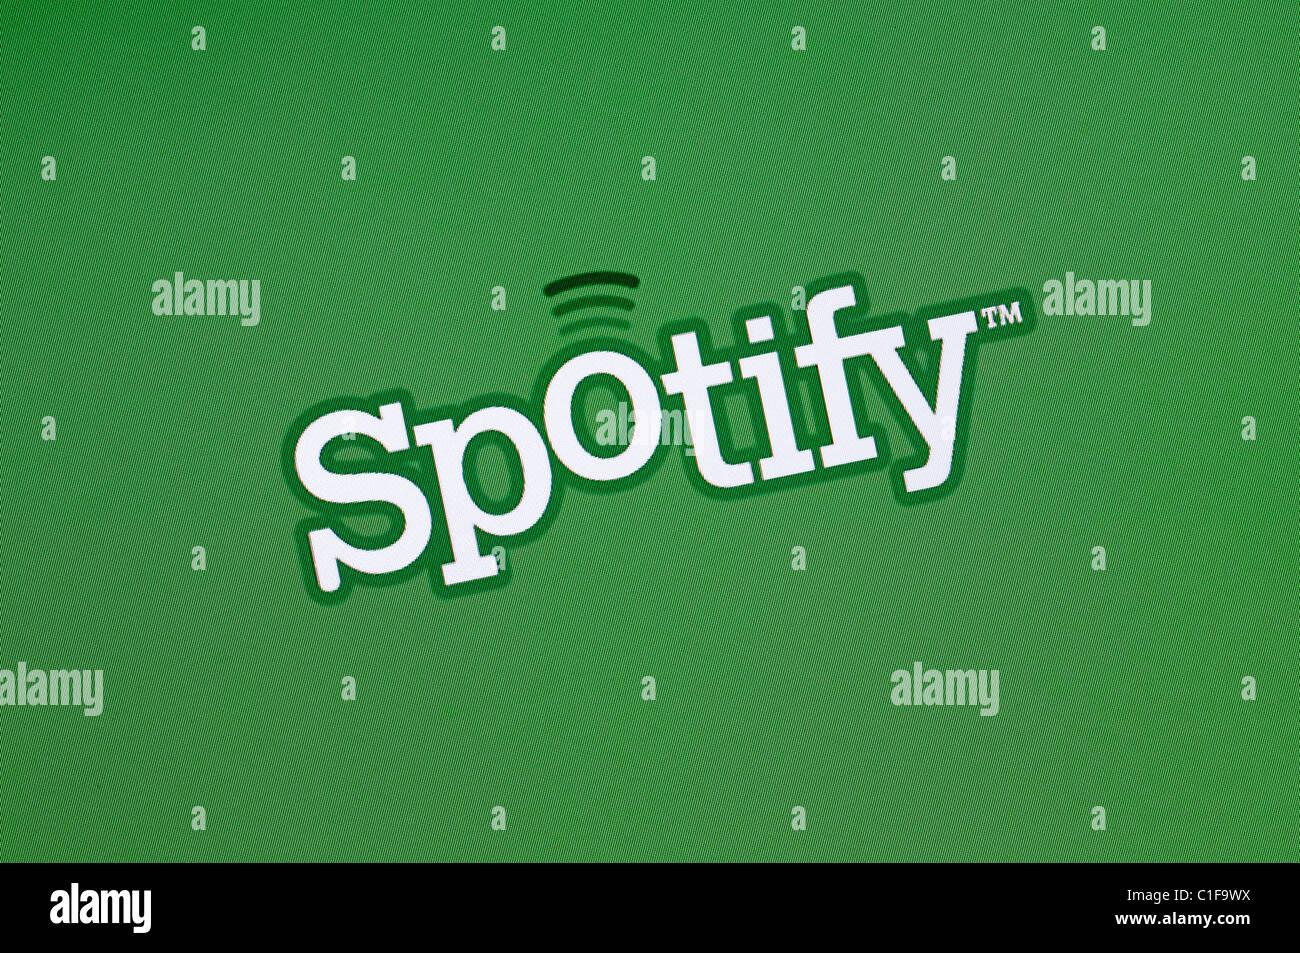 Spotify Logo Screenshot. Online Music Streaming Service. - Stock Image